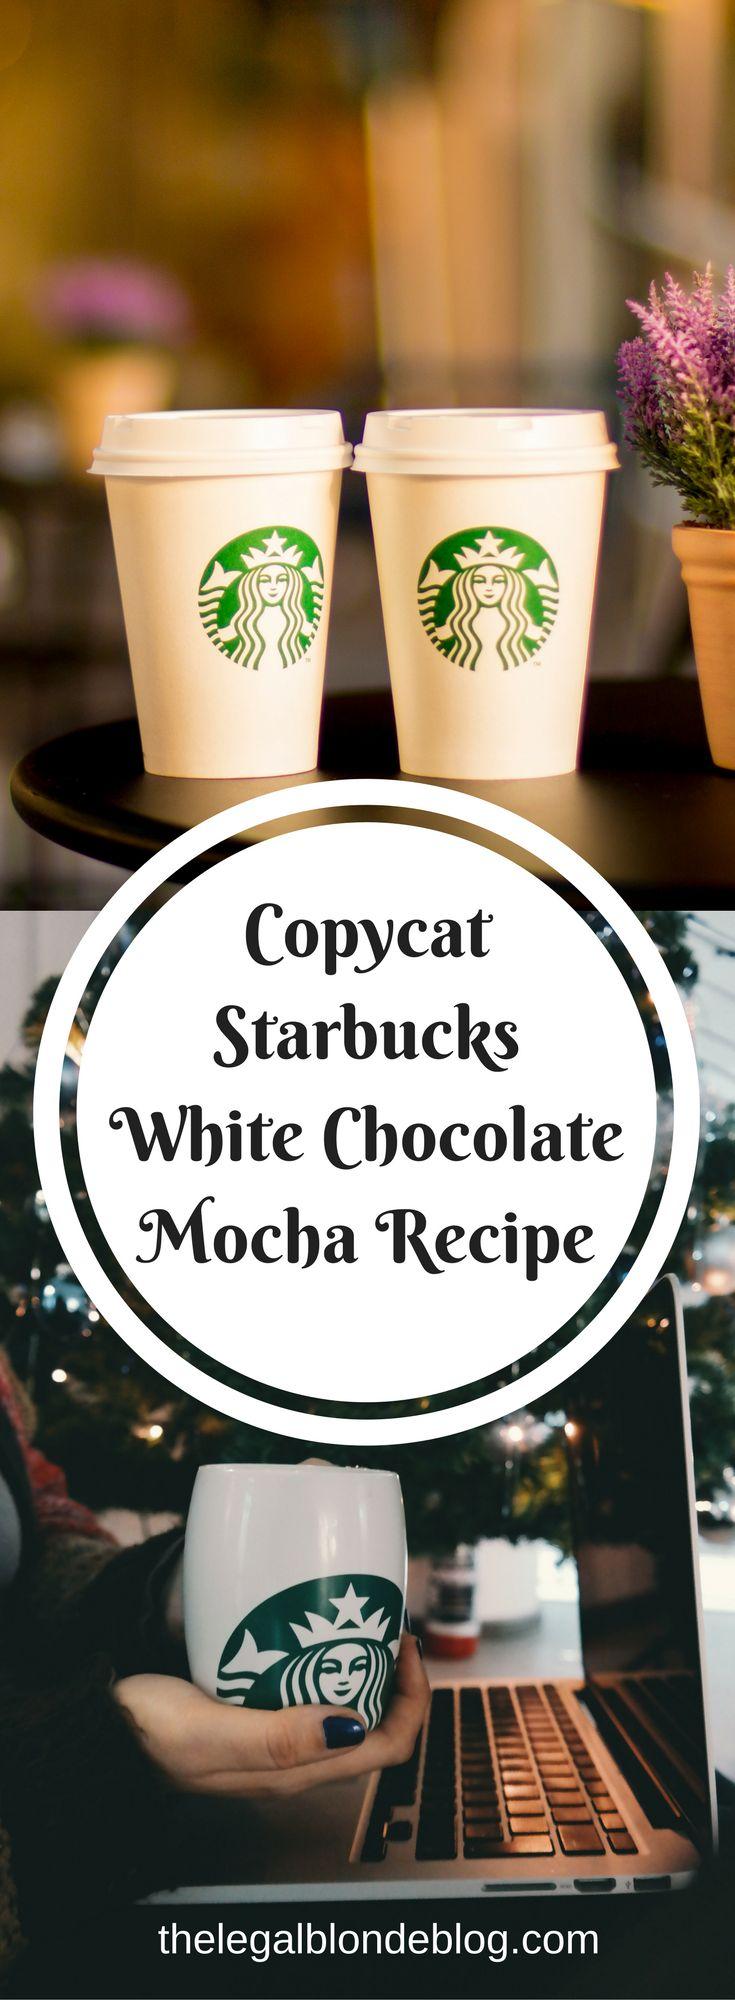 25+ best White chocolate mocha ideas on Pinterest | Starbucks ...